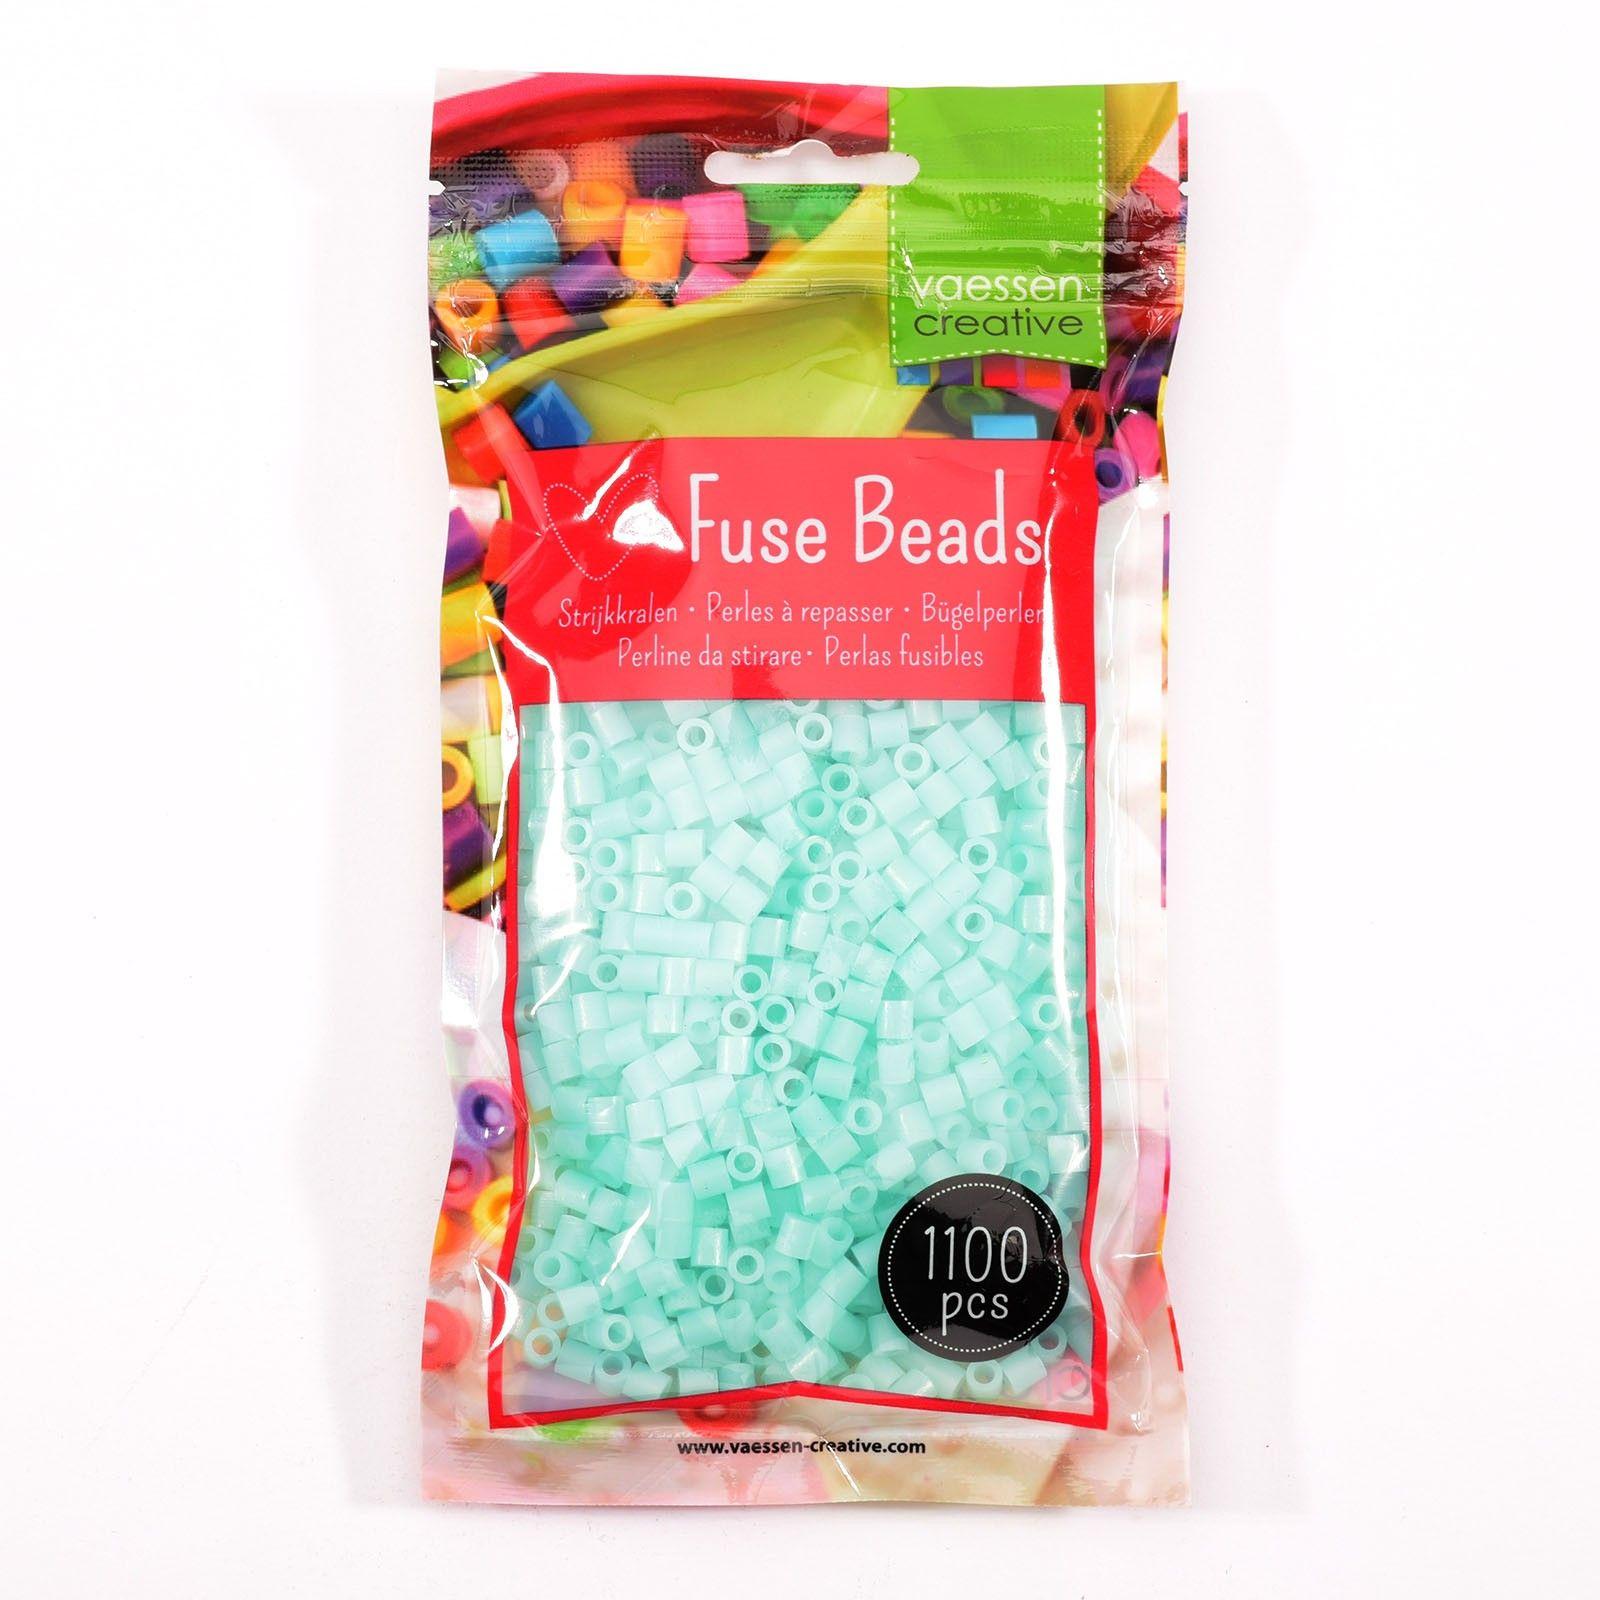 Sachet de 1100 perles à repasser - Ø 5 mm Coloris Bleu Fluorescent